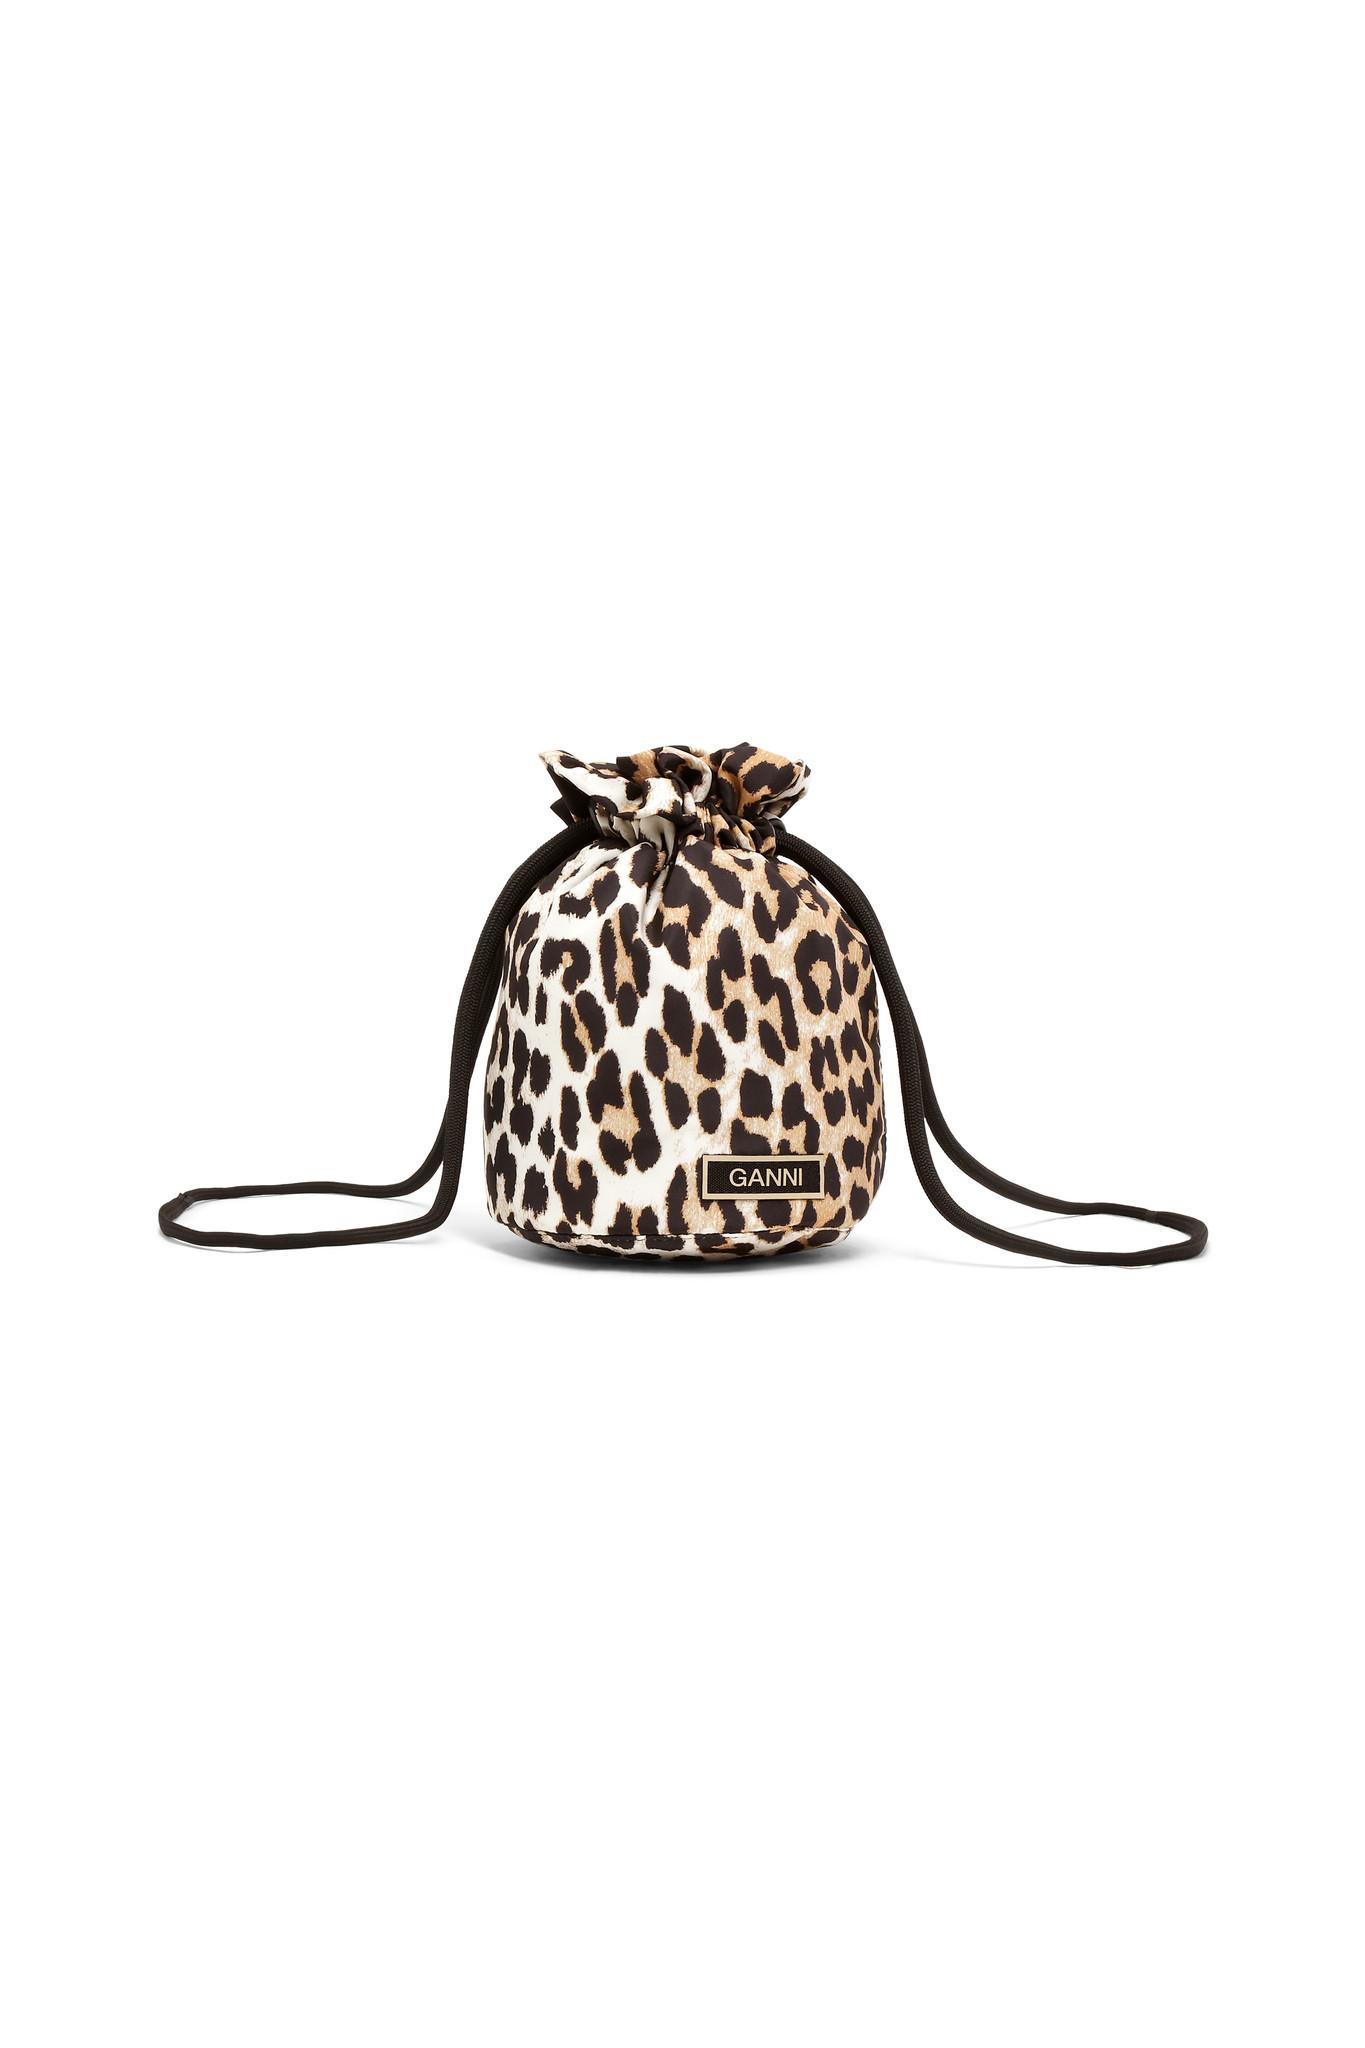 GANNI Recycled fabric Drawstring Purse in Leopard